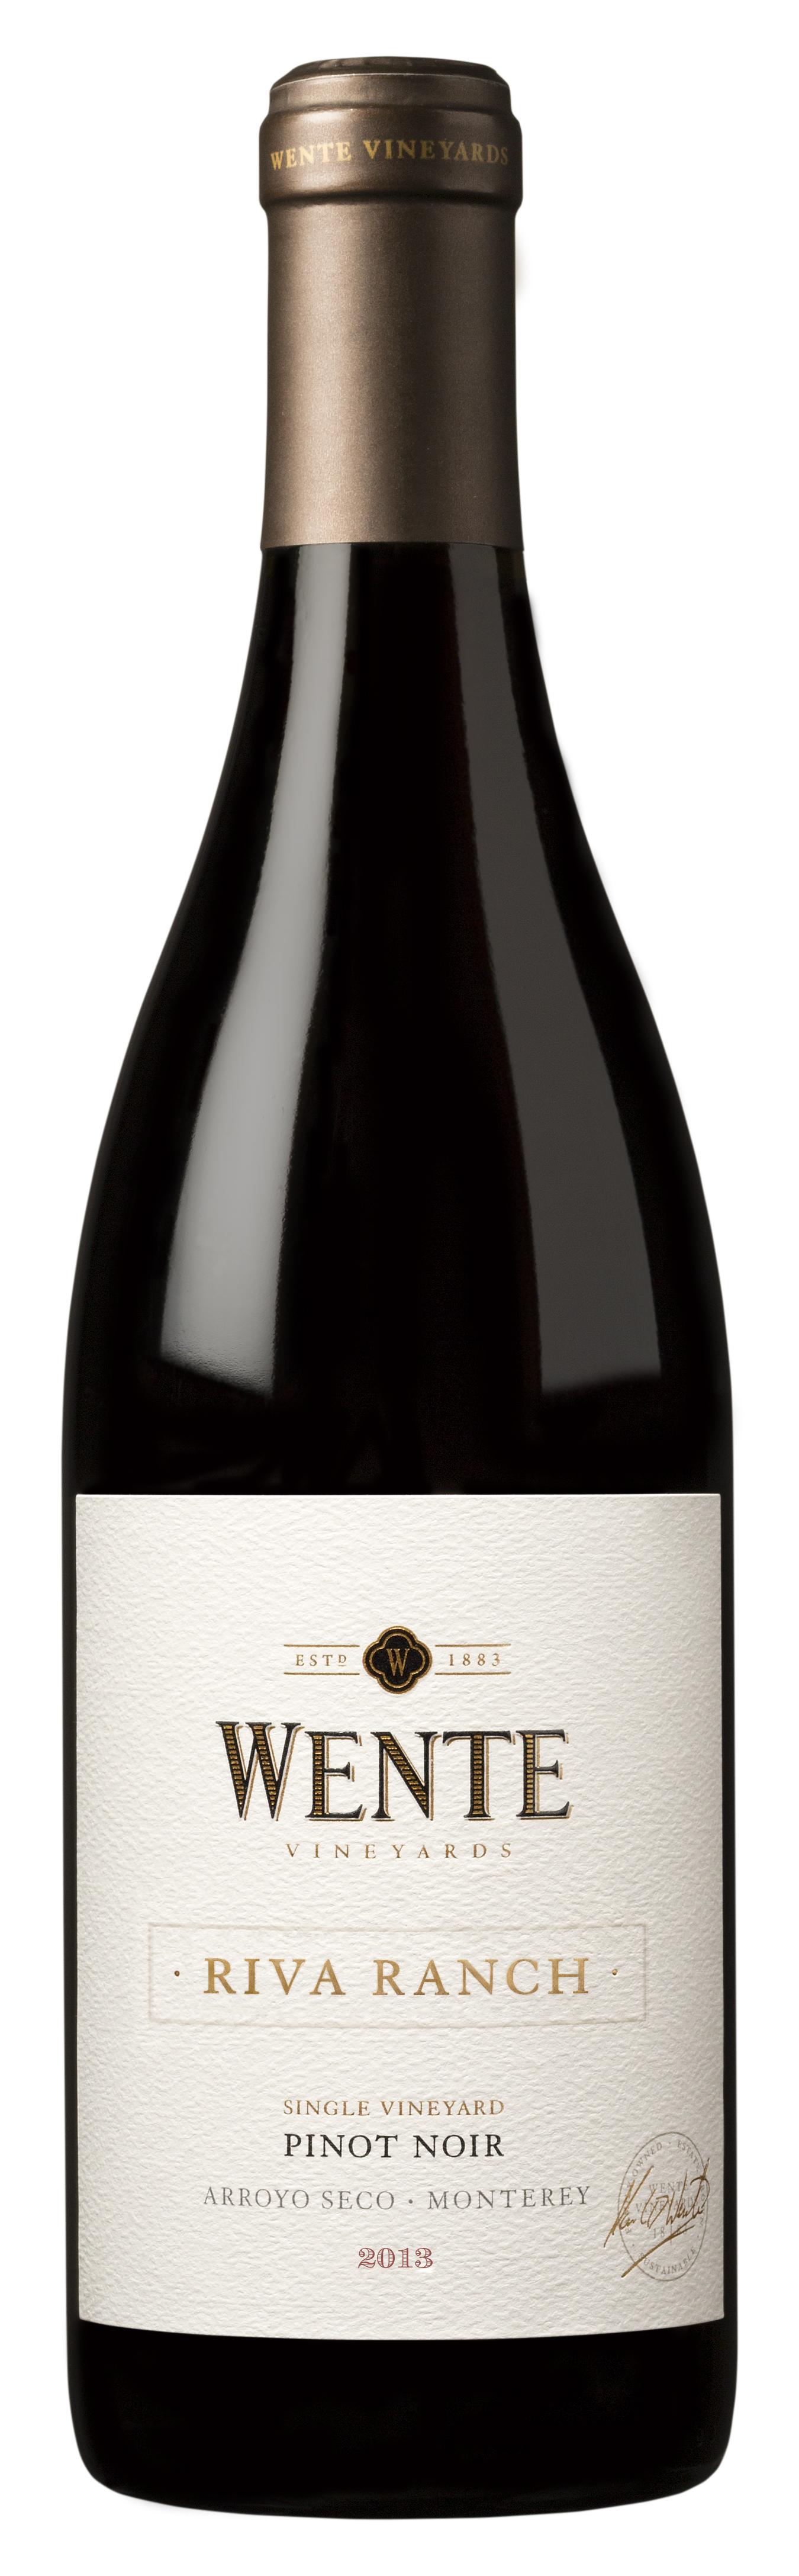 2013 Riva Ranch Pinot Noir